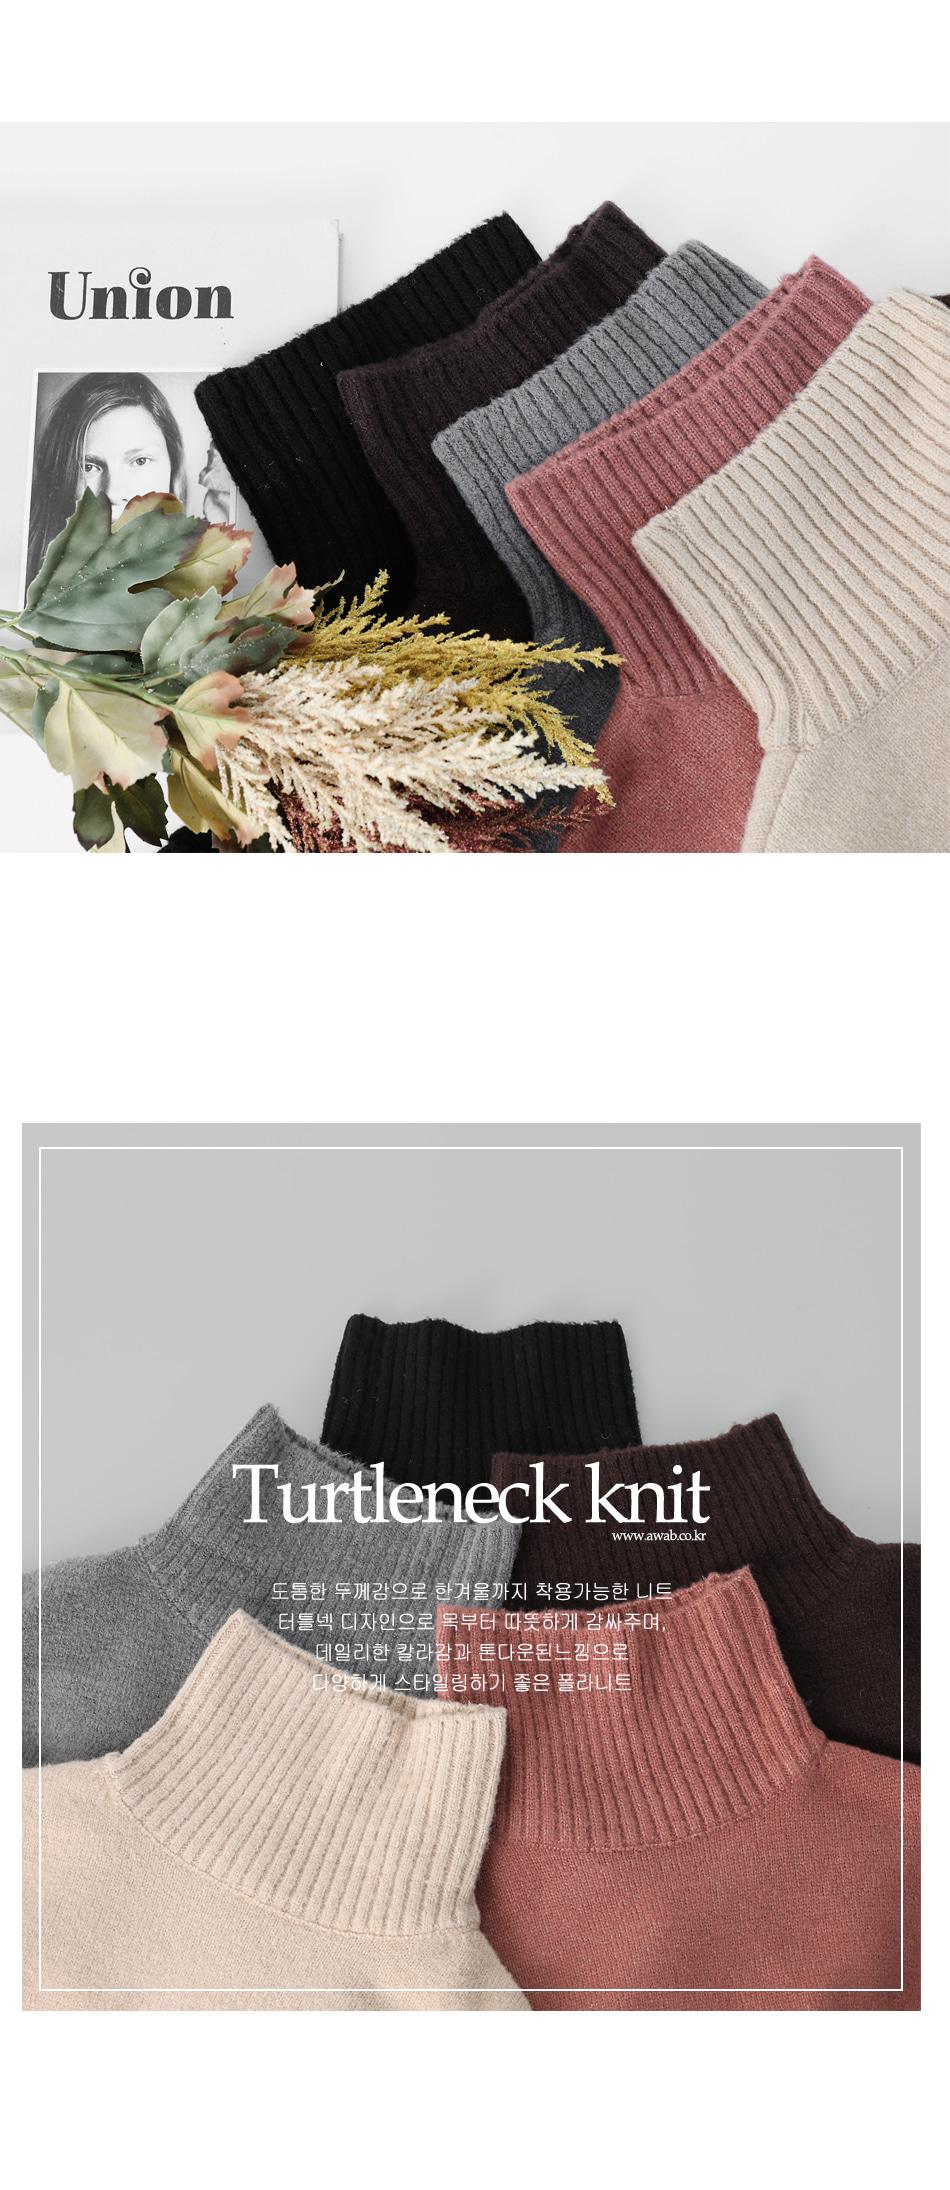 Newer turtleneck knit